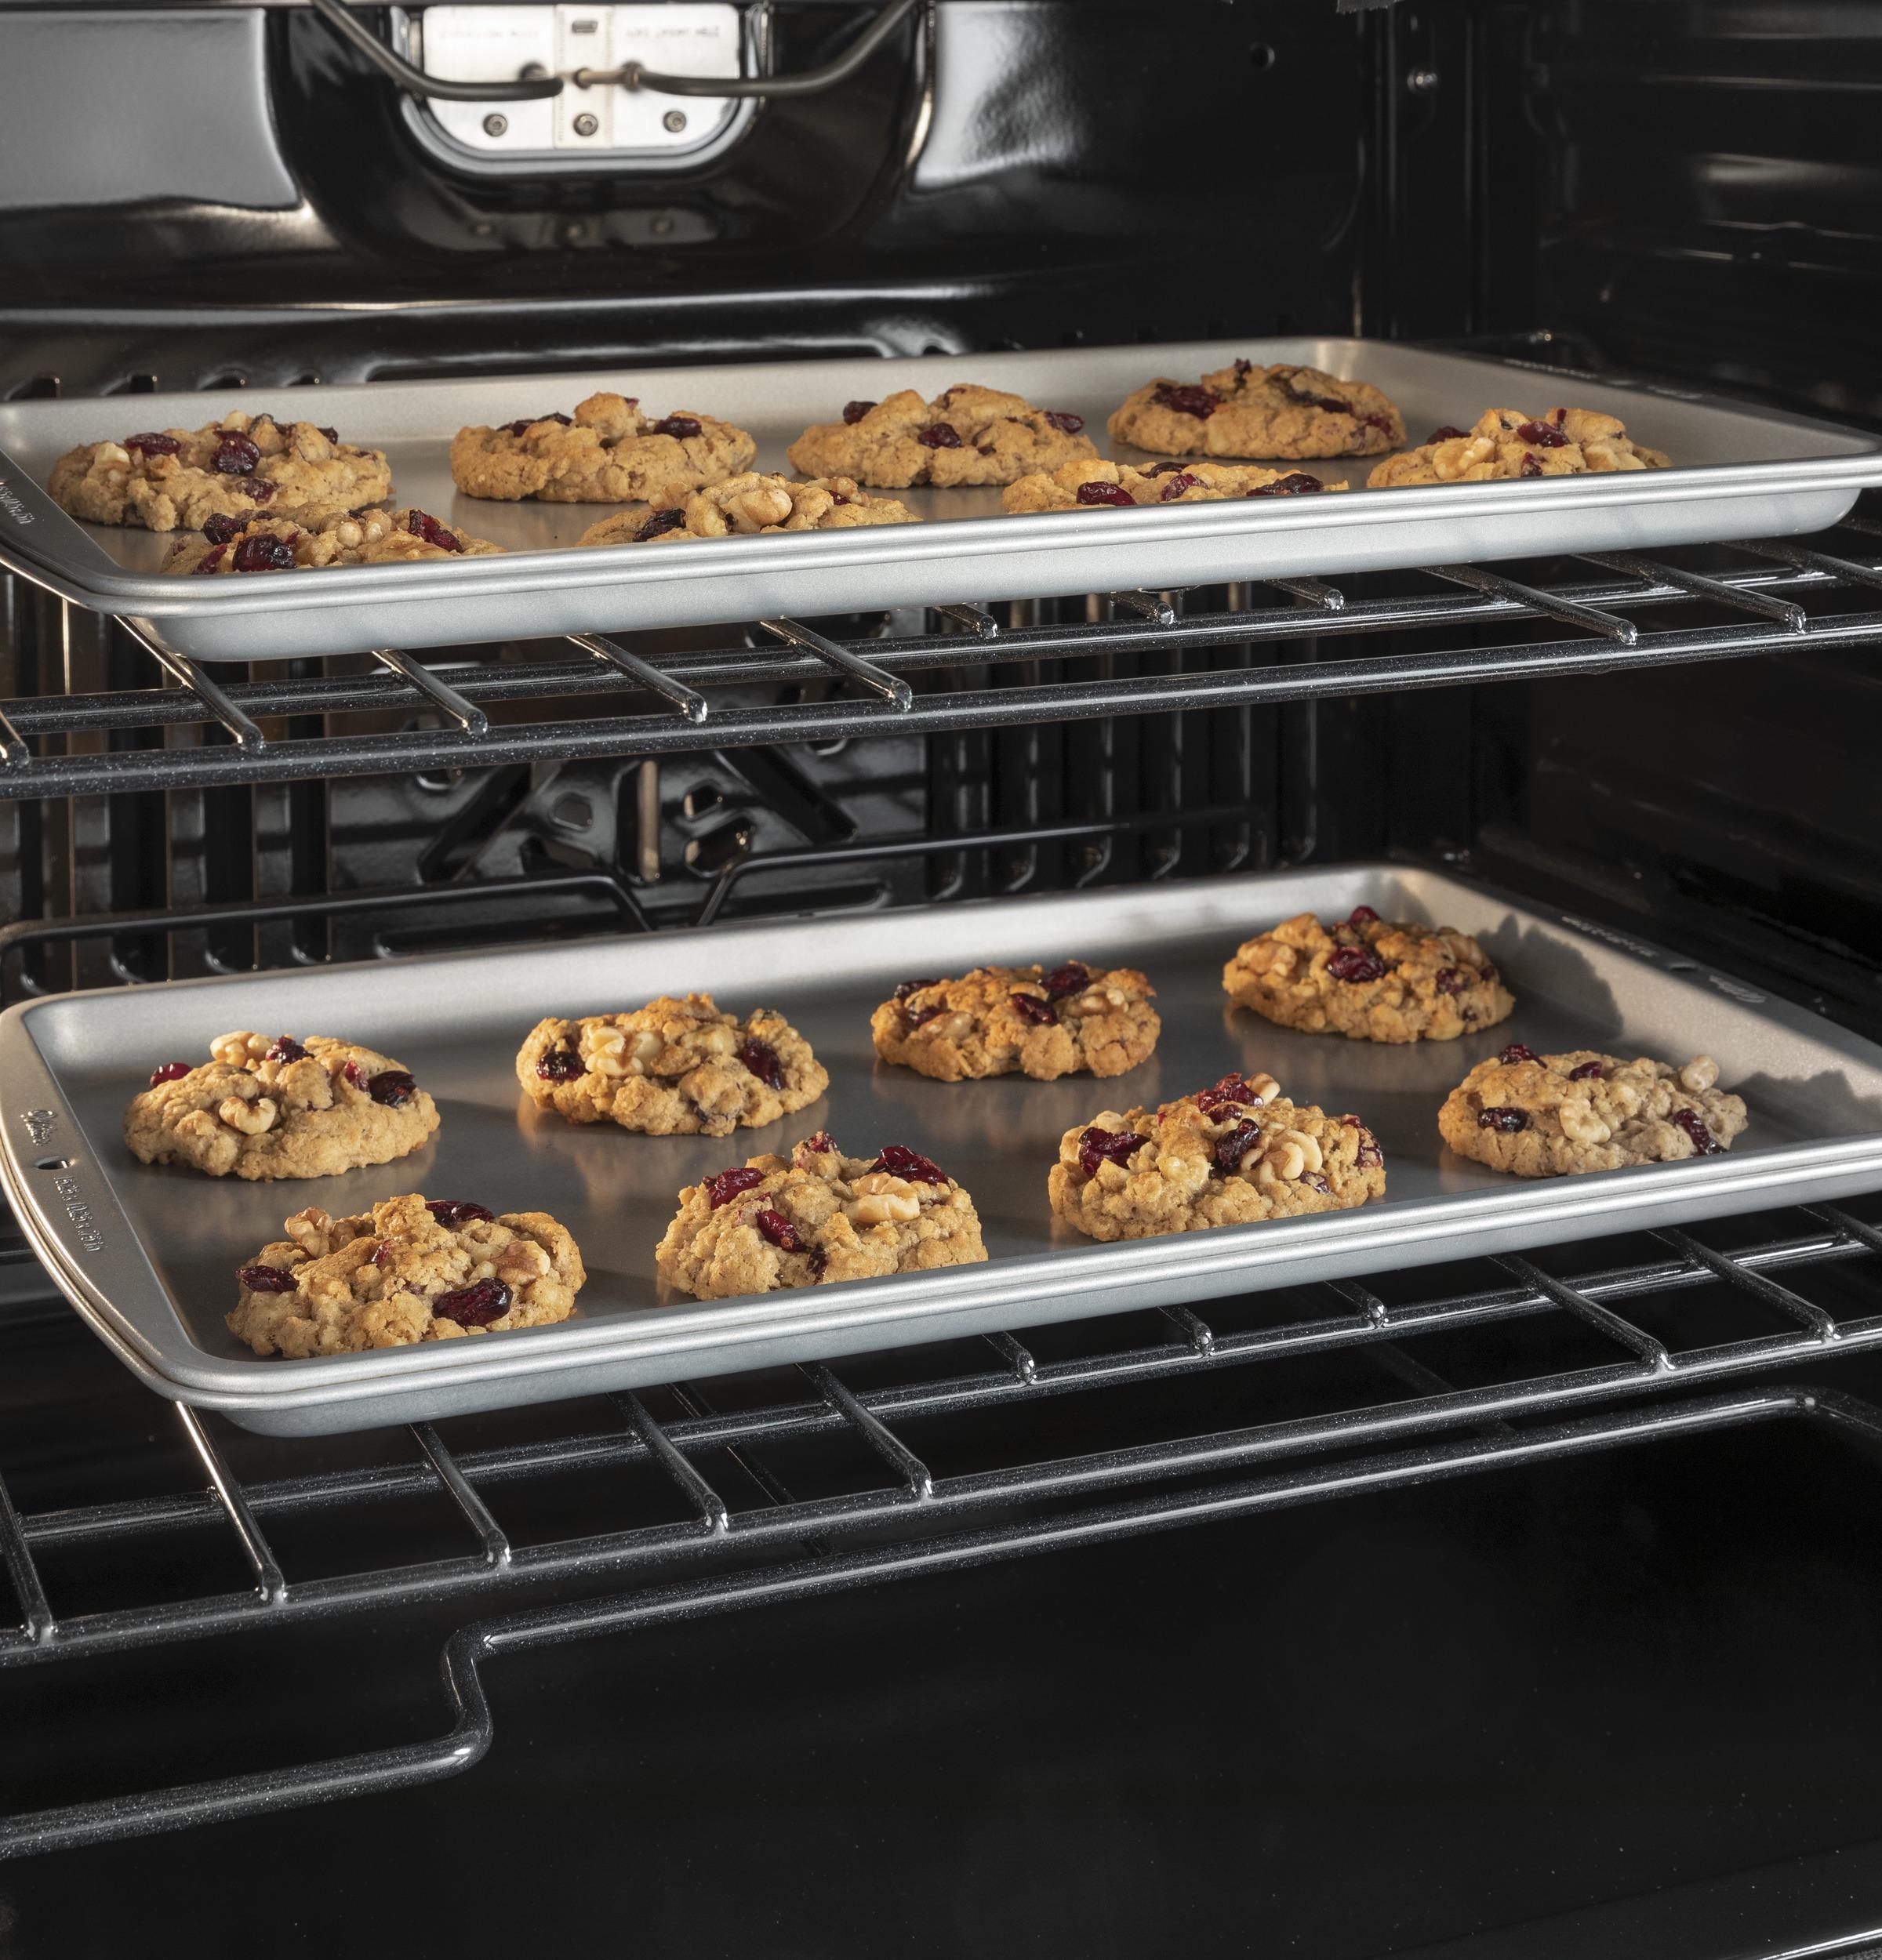 "Model: JKS5000DNBB | GE GE® 27"" Smart Built-In Convection Single Wall Oven"